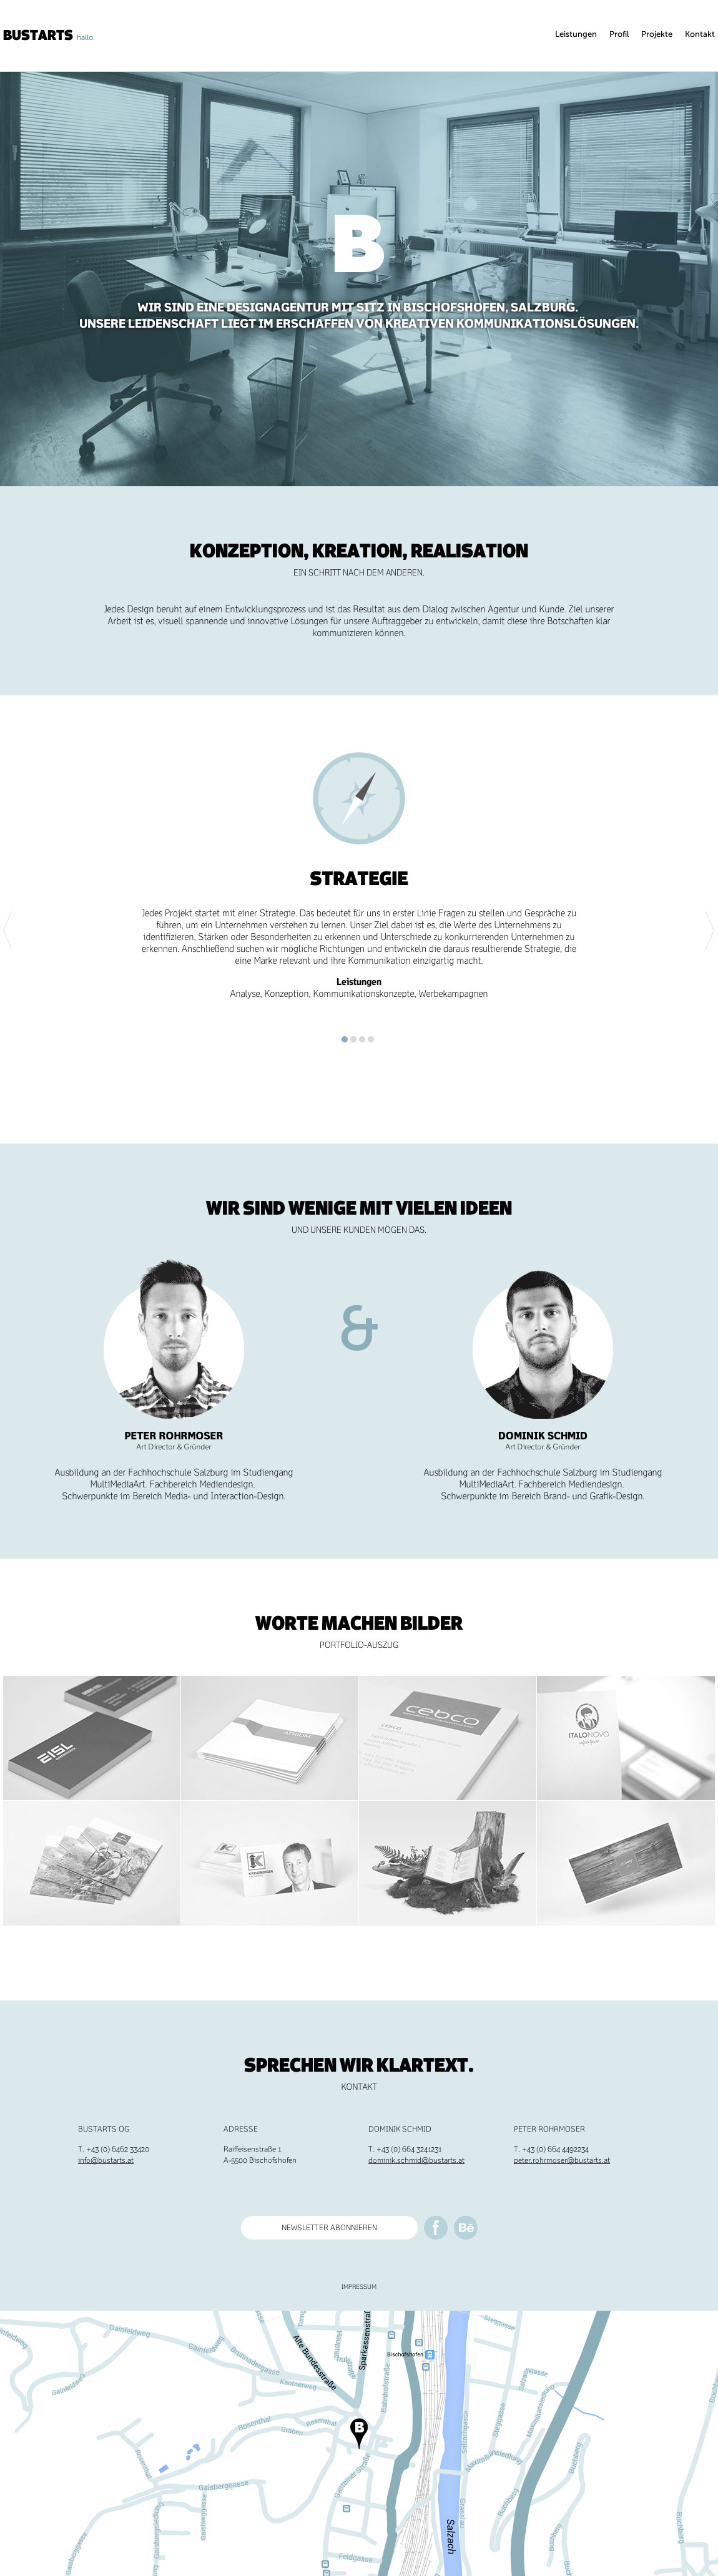 Responsive One Page Portfolio With A Soft Blue Schemed Flat Design For Digital Agency Bustarts From Au Minimal Web Design Unique Web Design Web Design Awards